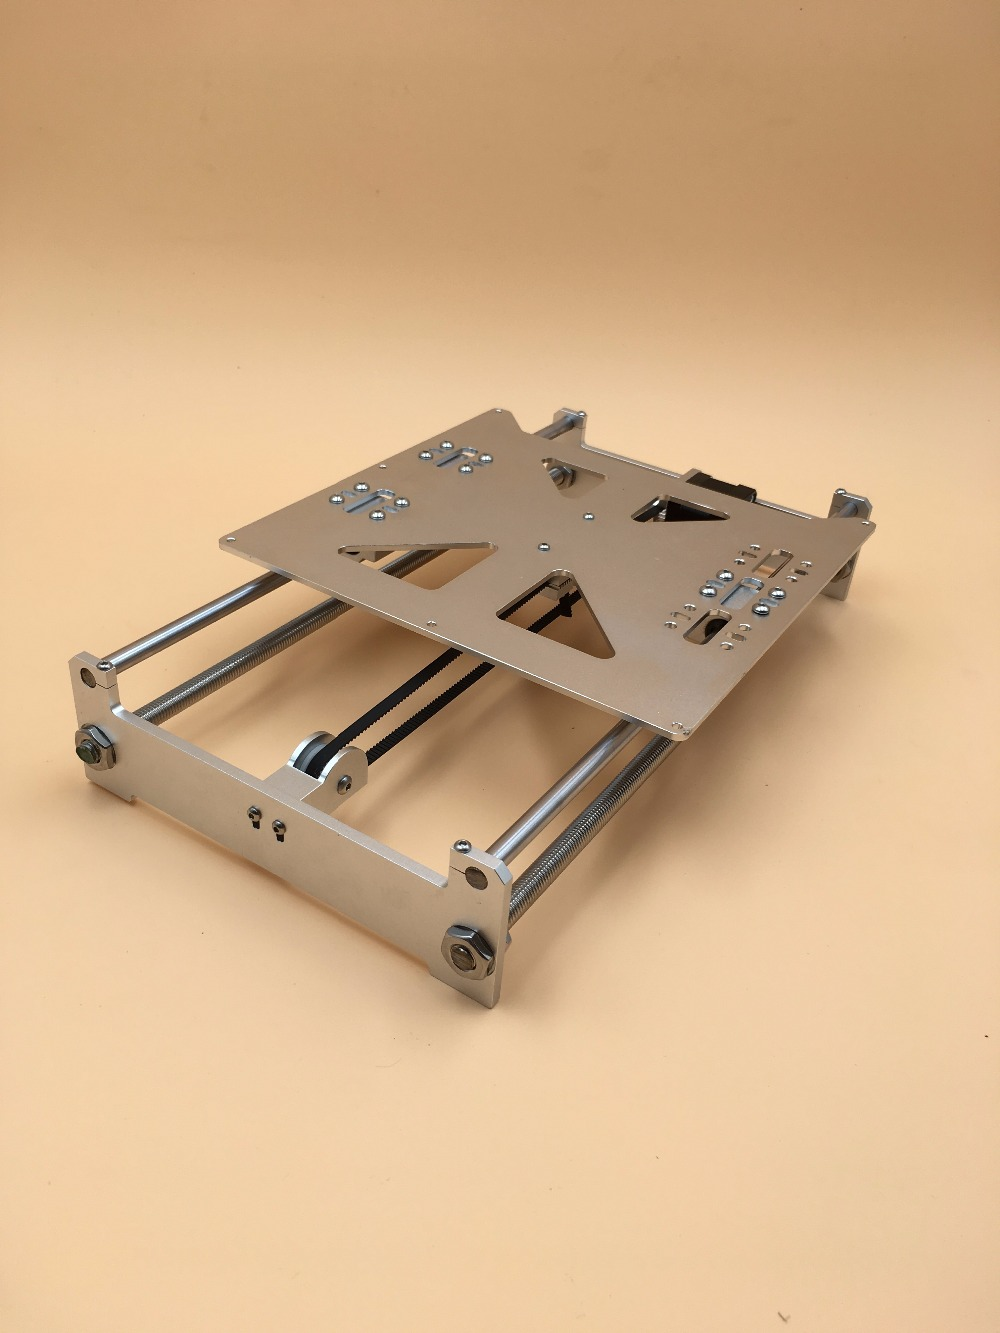 Reprap Prusa i3 Y-axis metal heated frame  Update Base print plate kit kit aluminum alloy